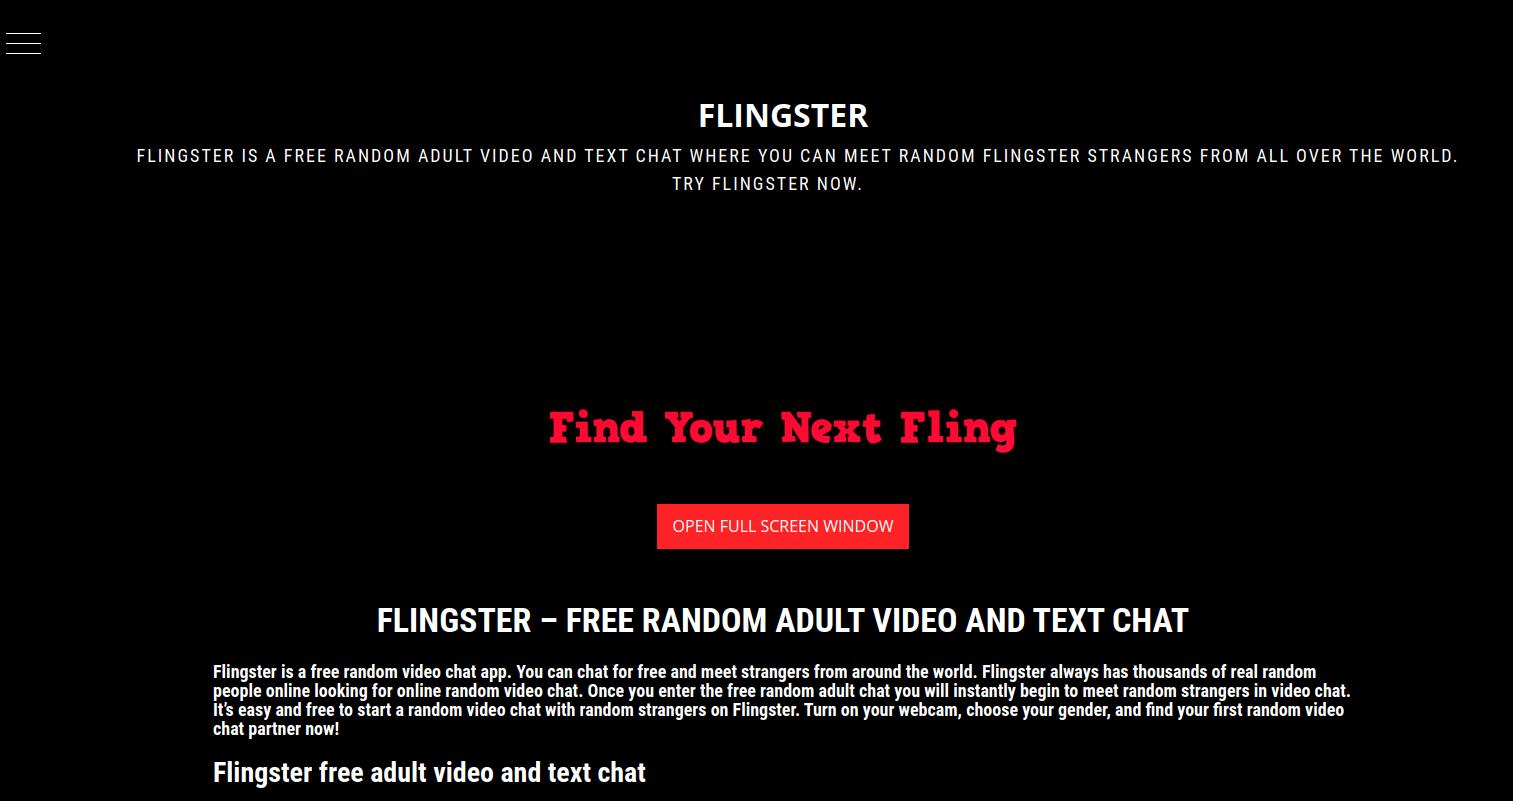 Flingster Home Page Screenshot